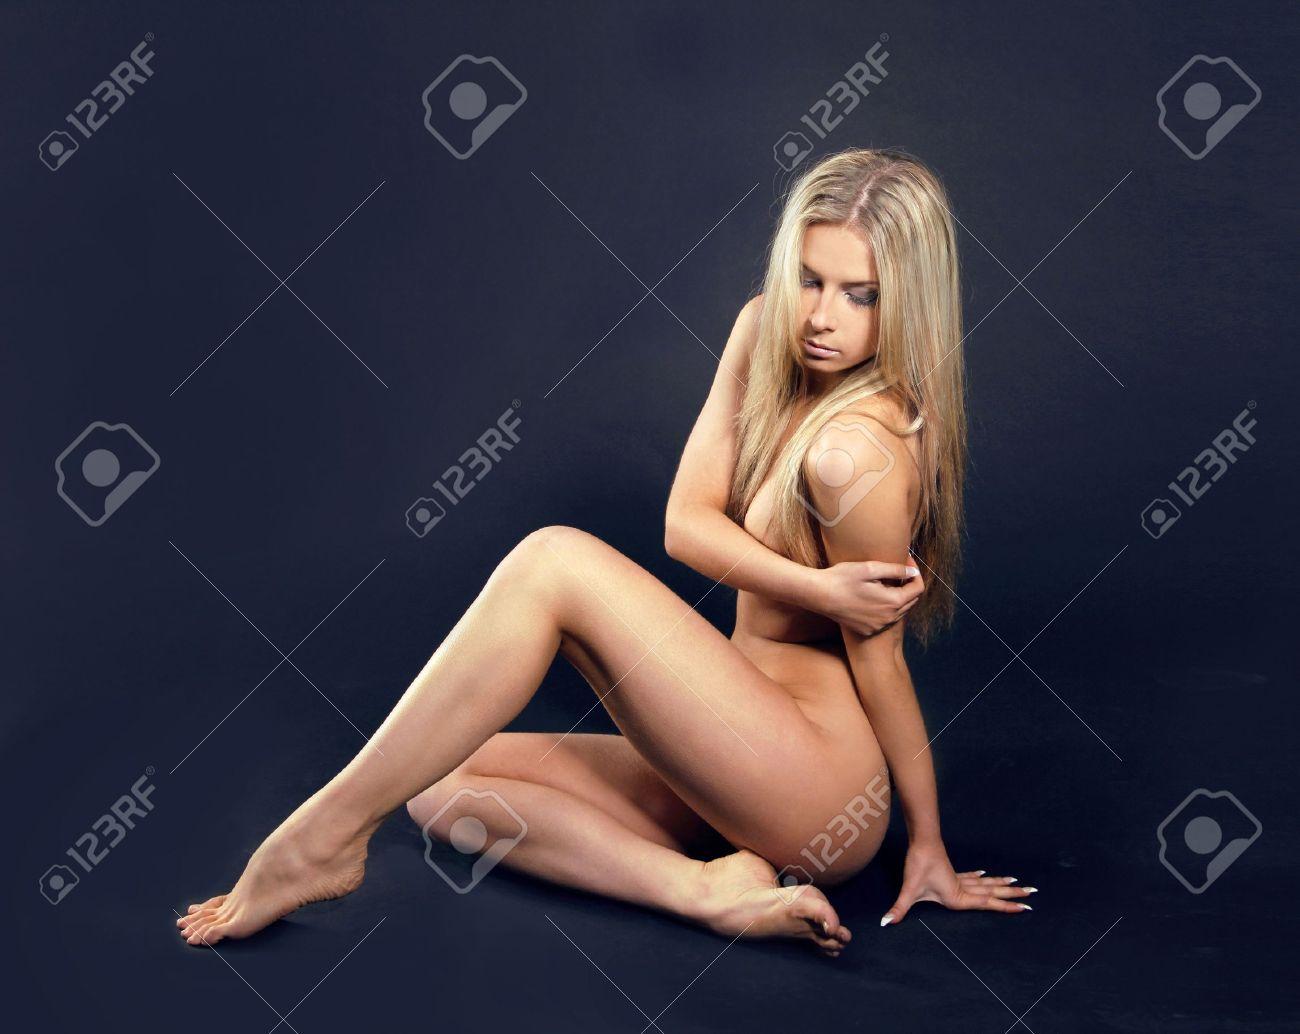 Jeniferlopeznudephotos Womens Sexiest Nude Tan Bodies